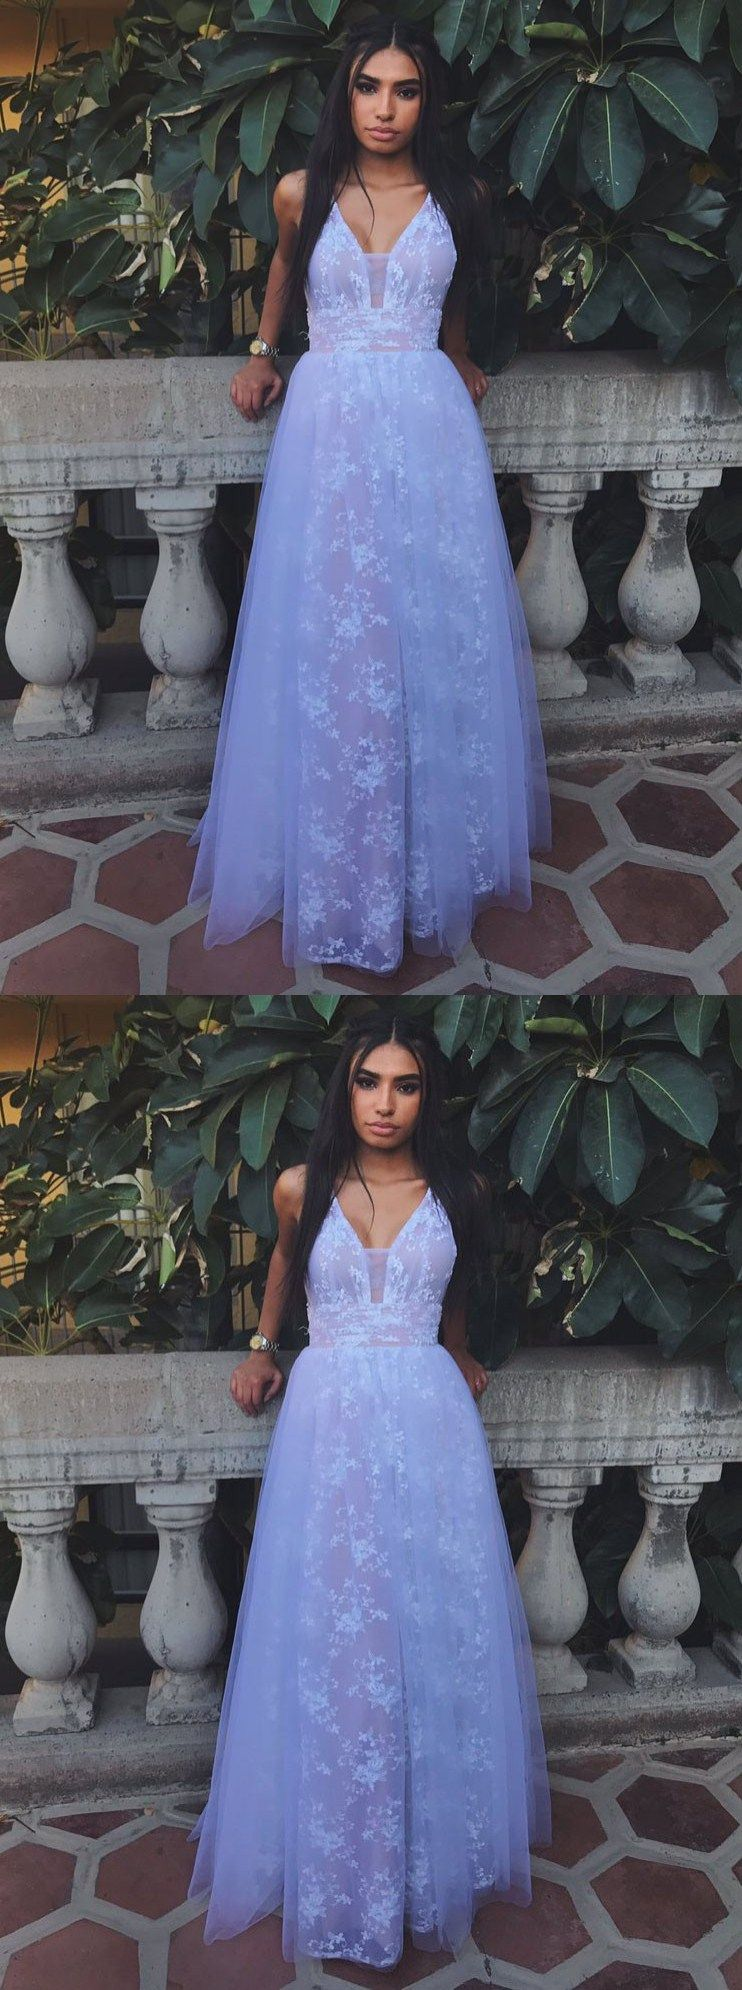 Aline vneck backless lavender tulle prom dress with lace modern